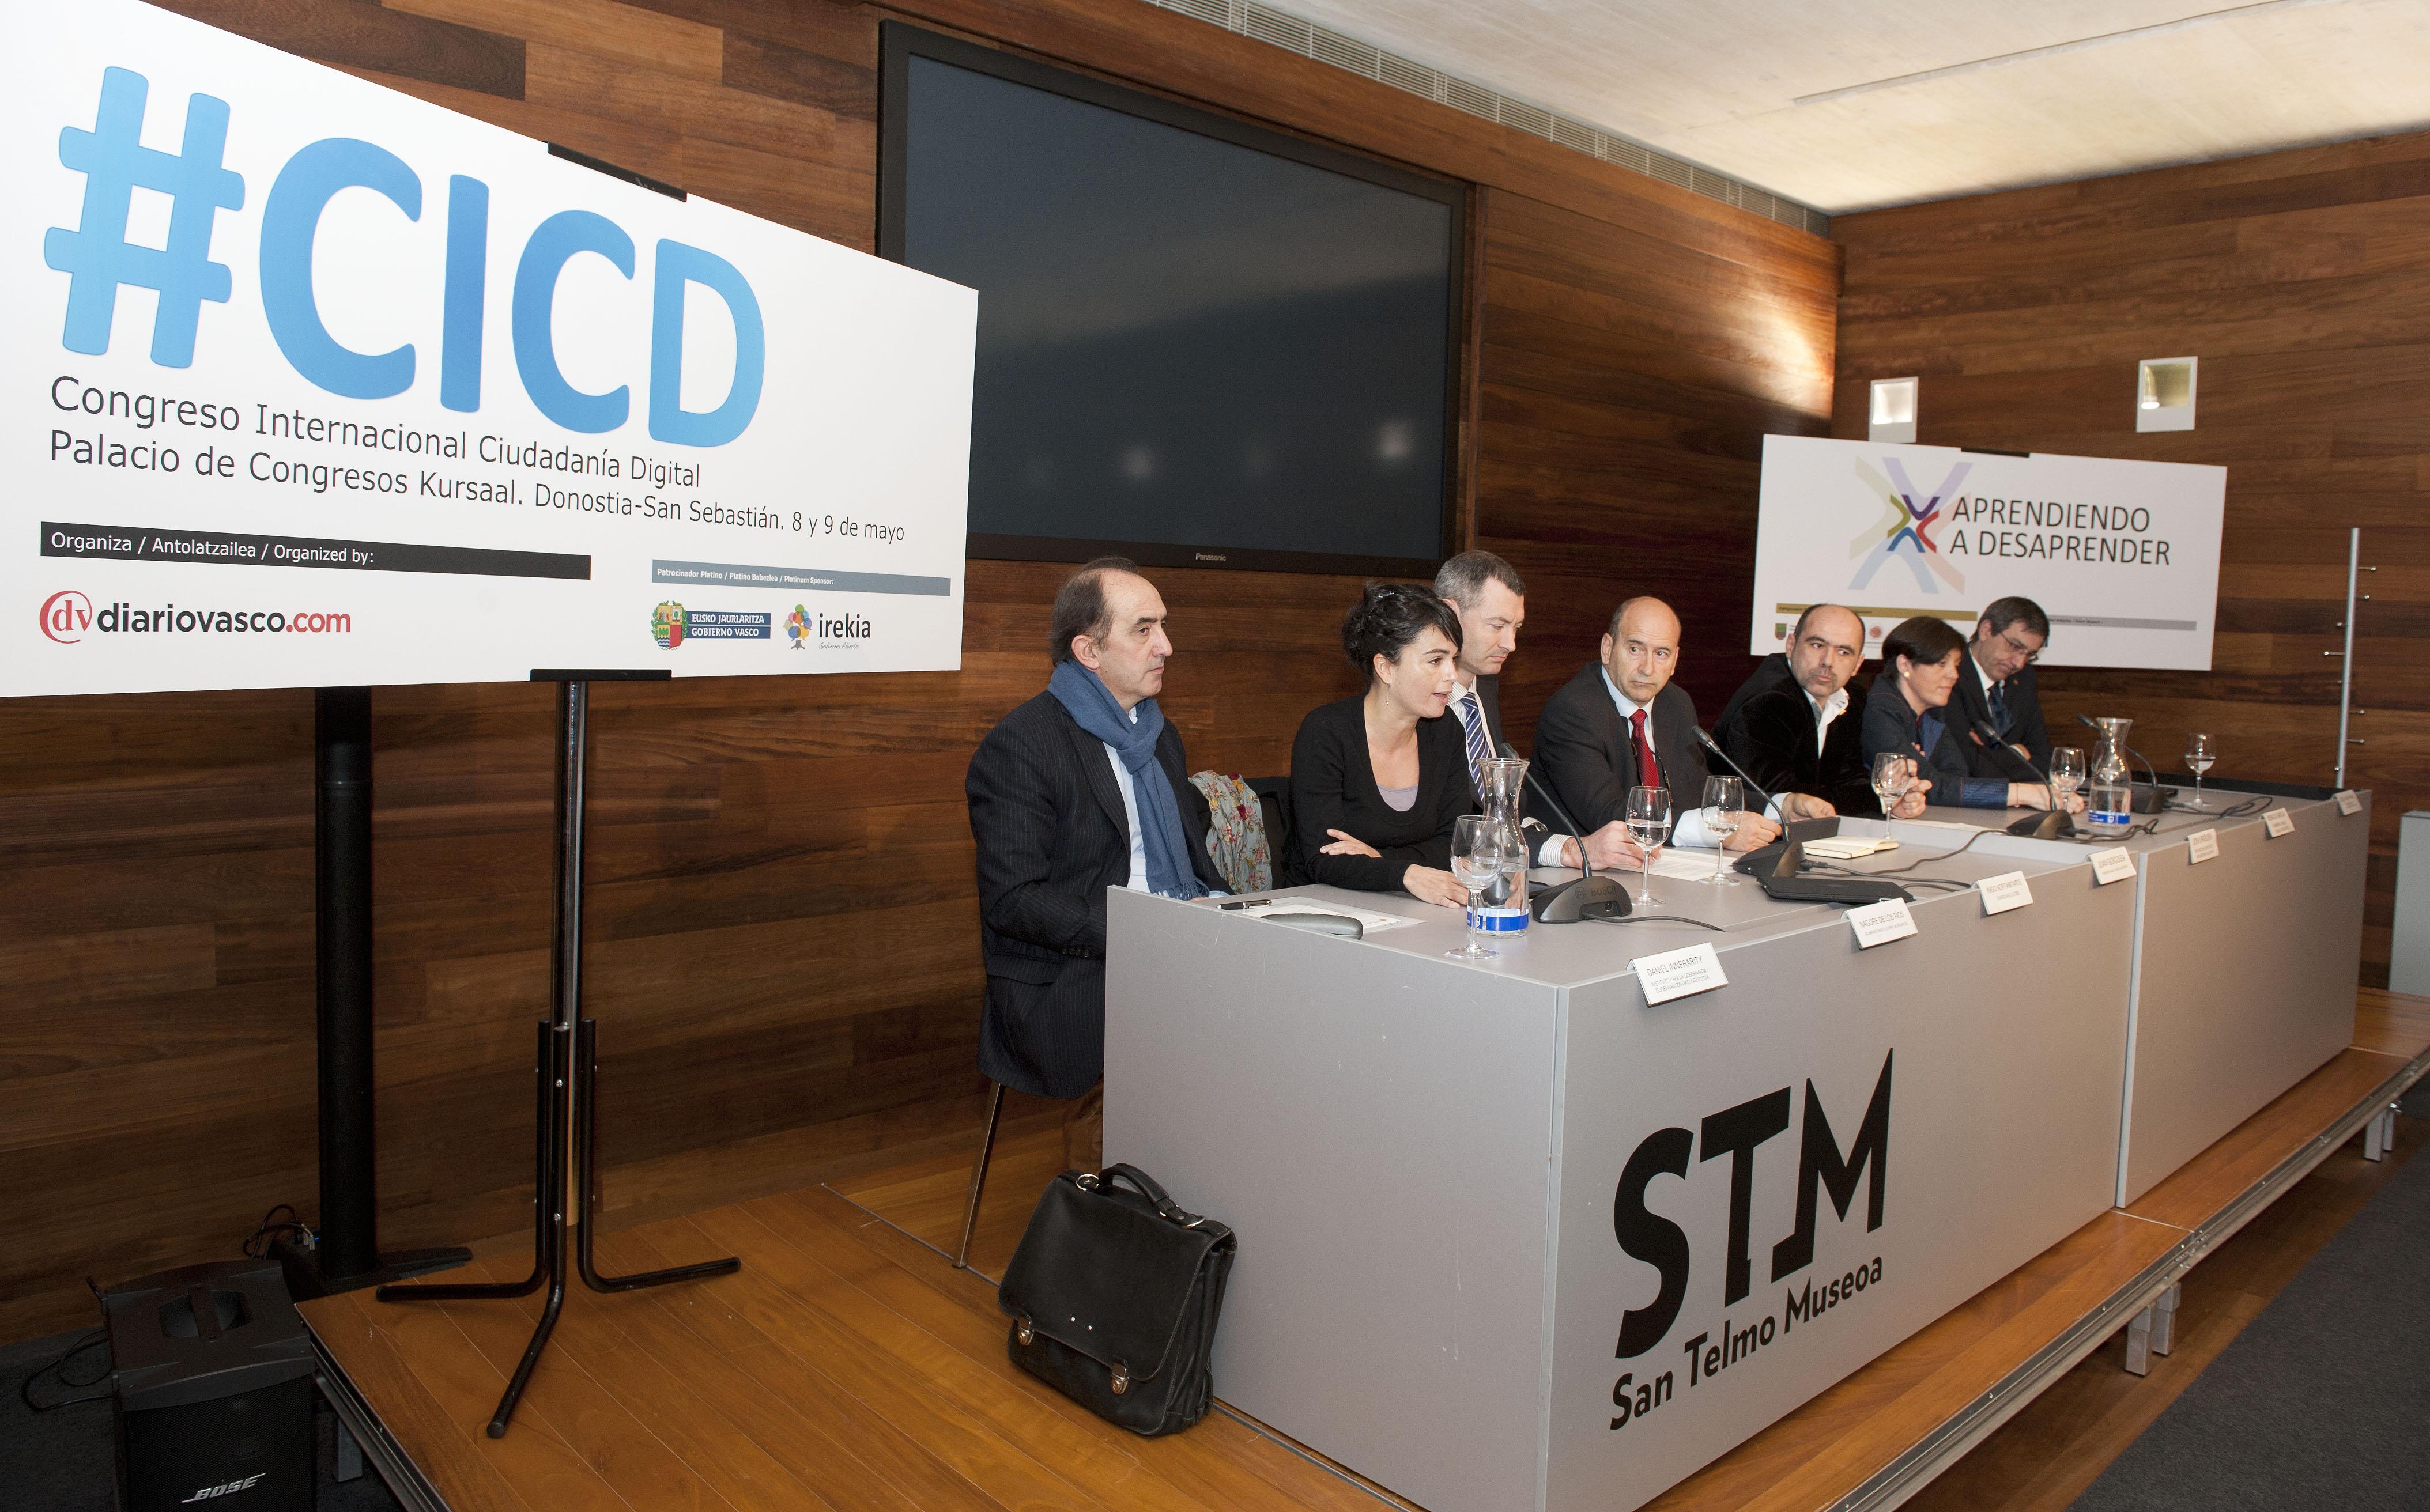 2012_03_12_congreso_ciudadania_digital_05.jpg